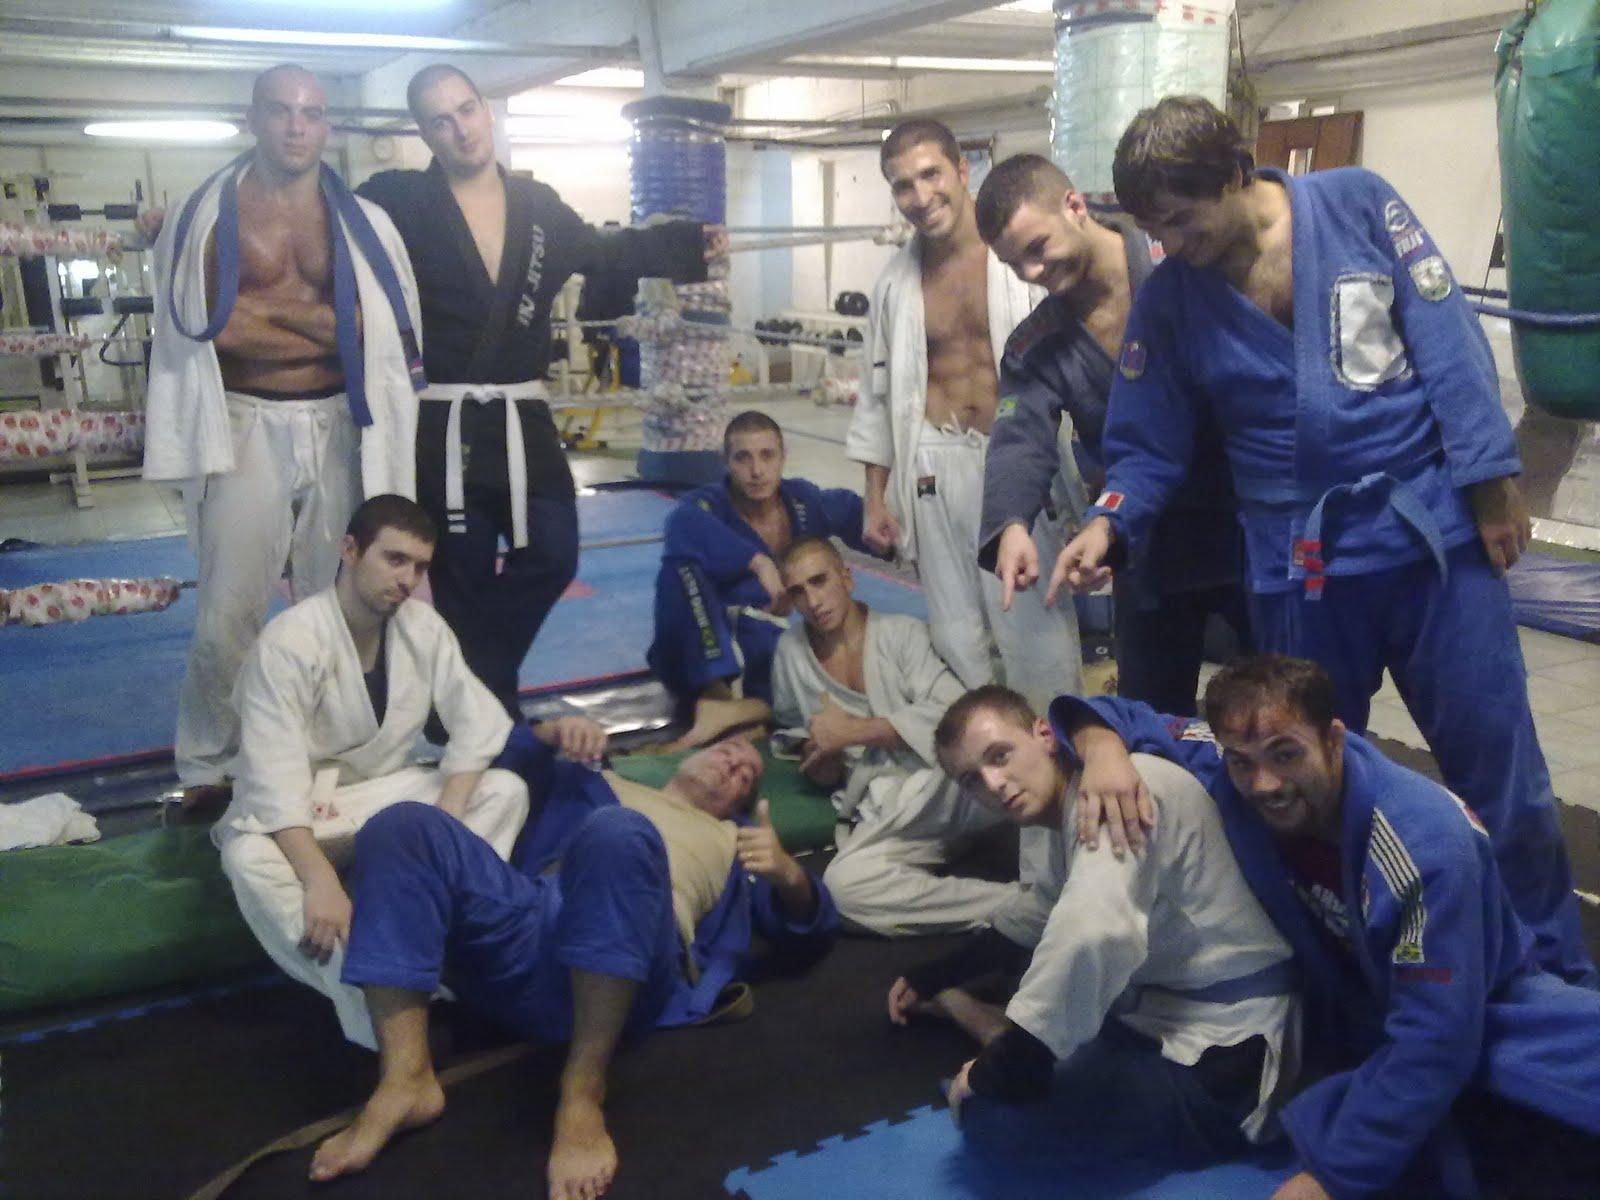 programma di dieta di jiu jitsu brasiliano